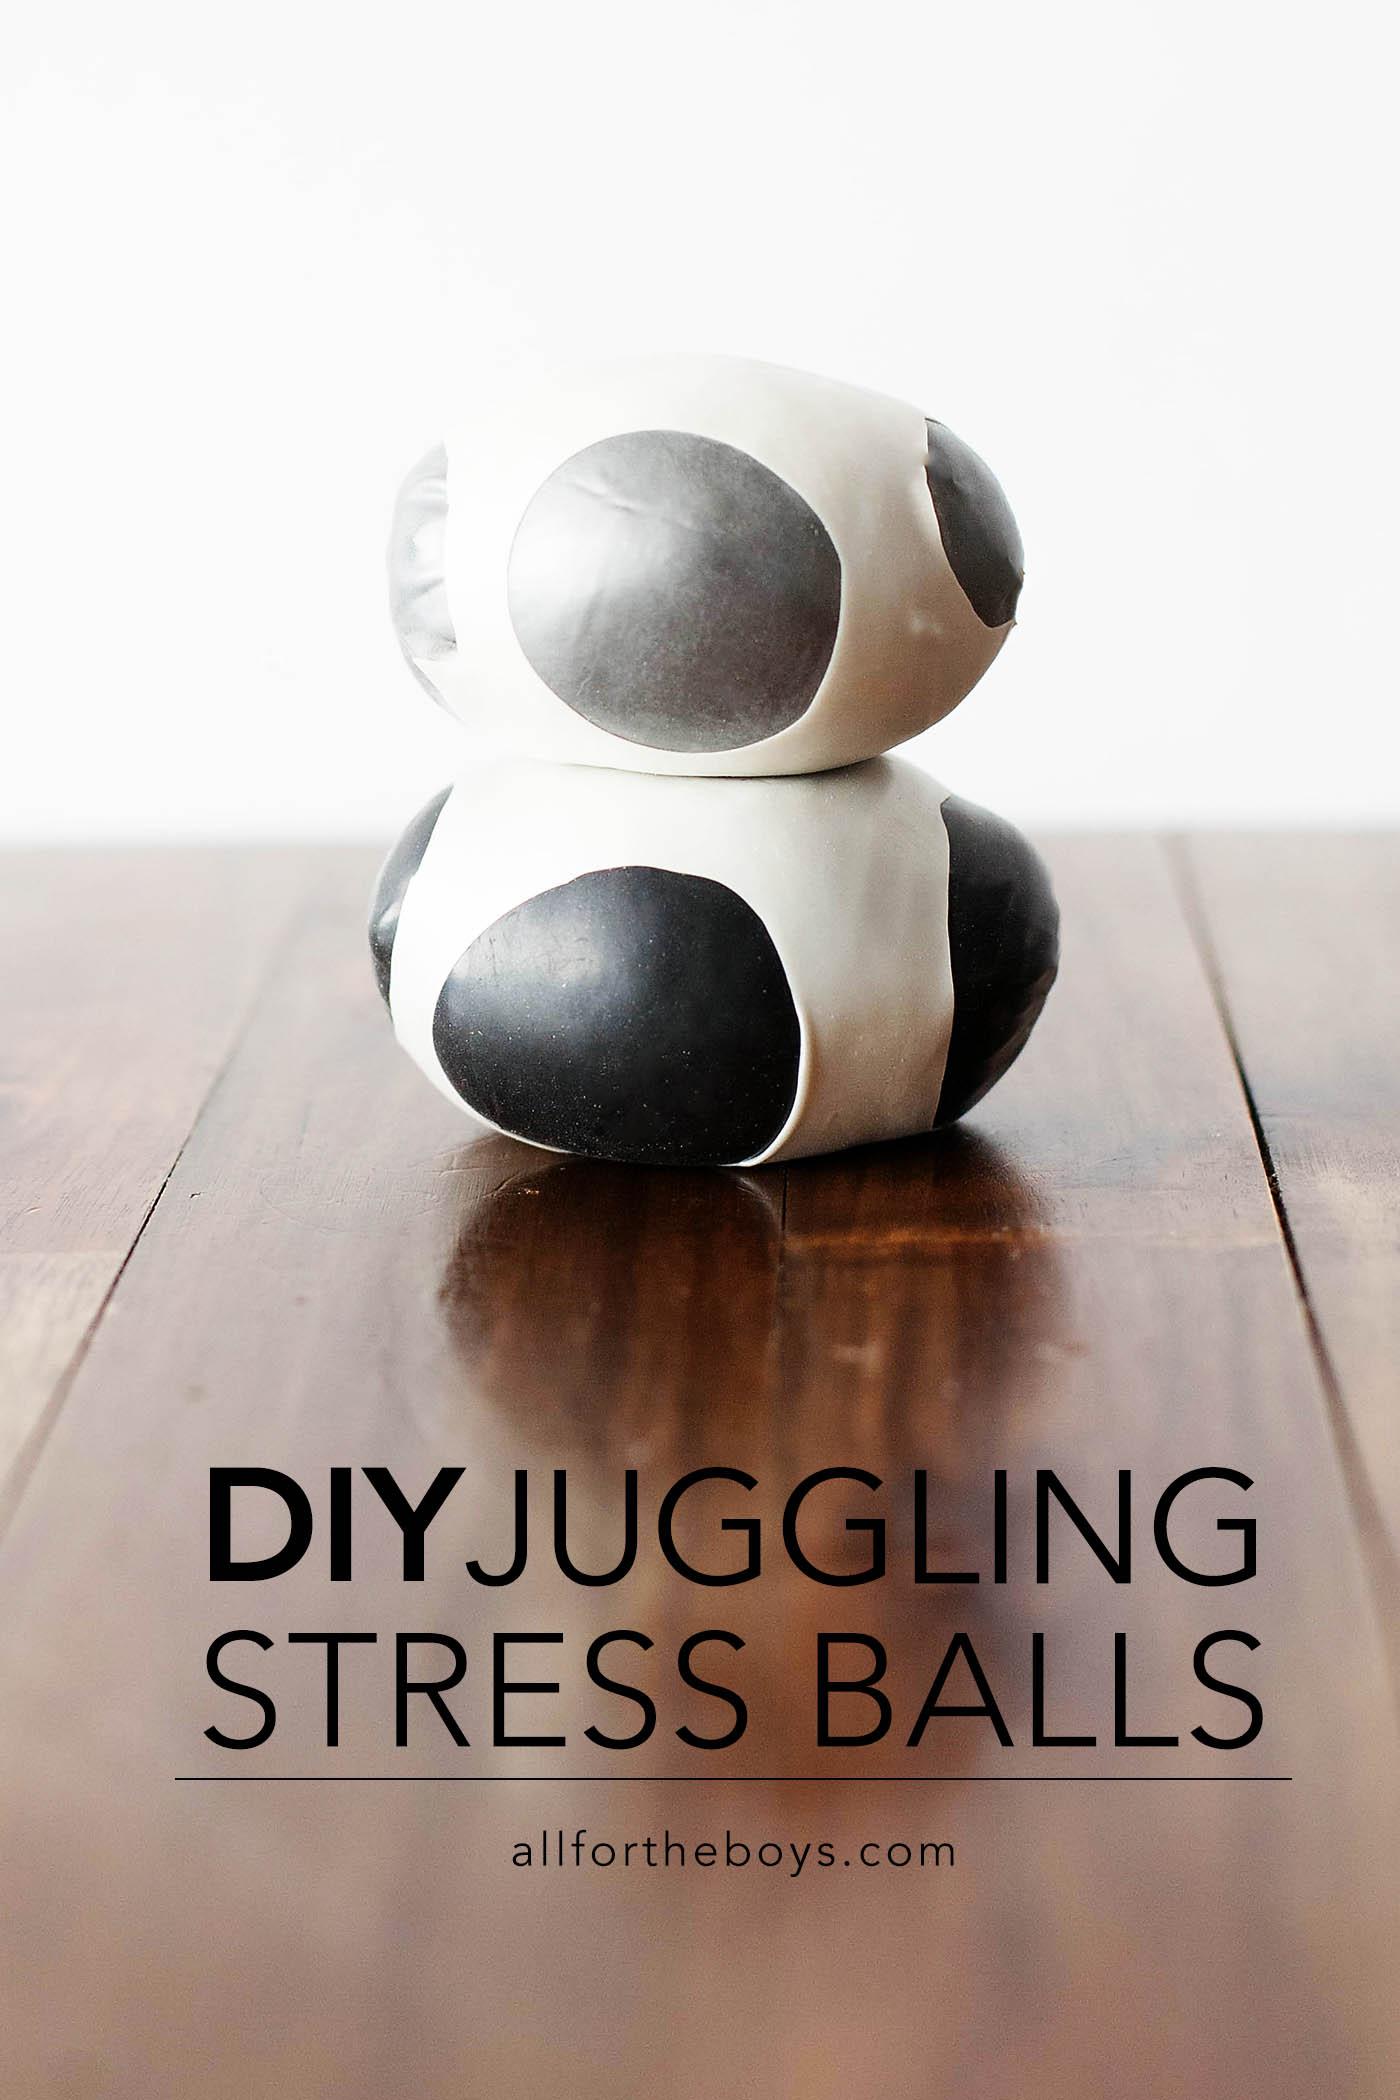 DIY juggling stress balls